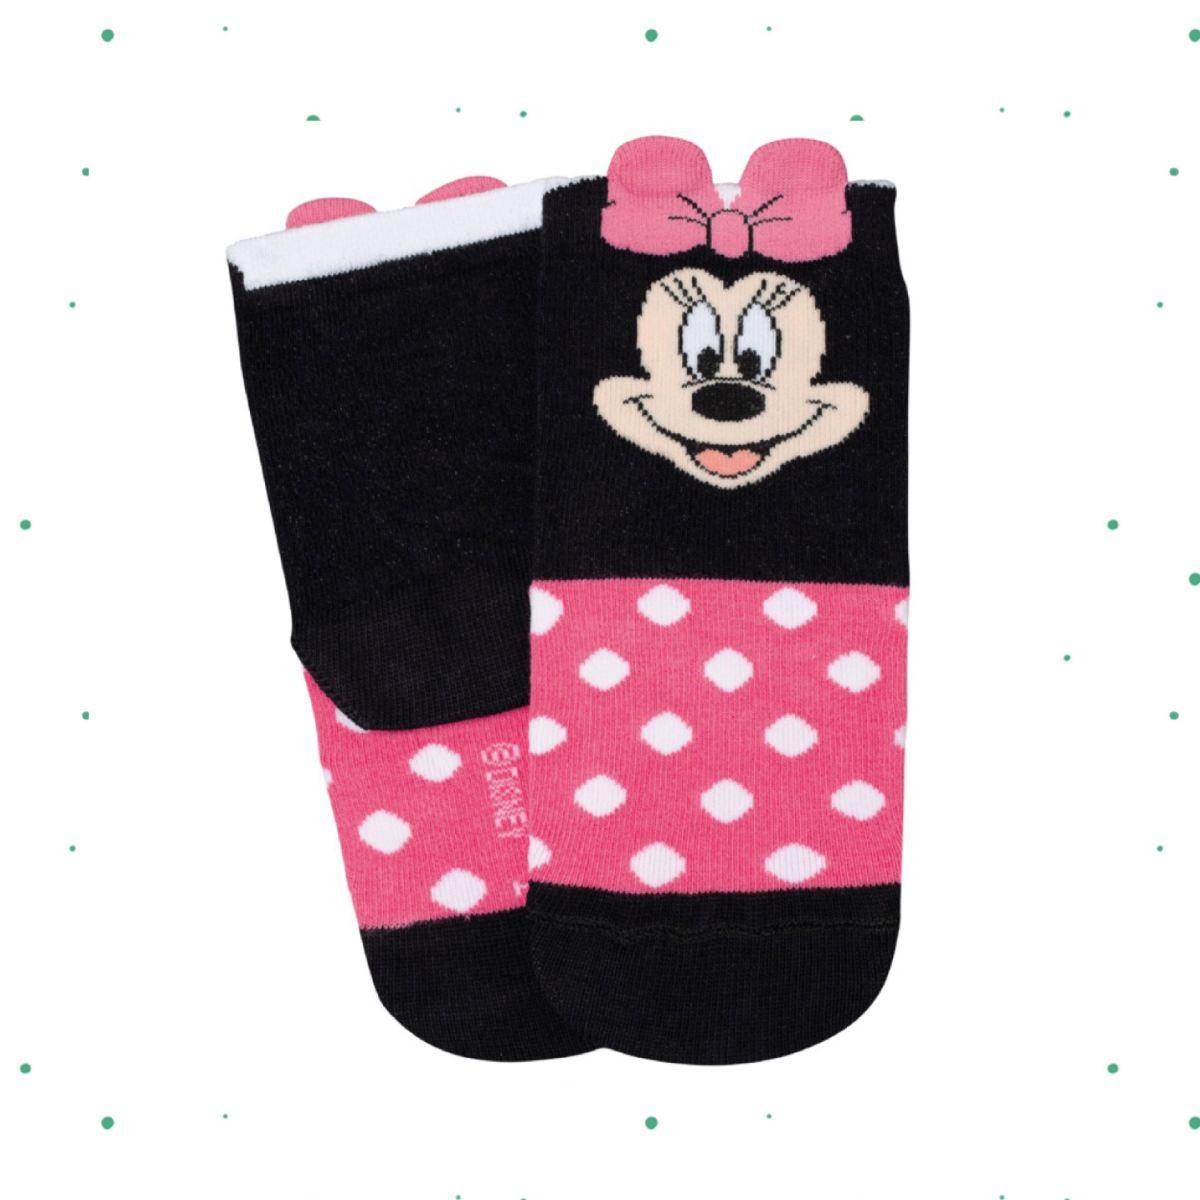 Meia Infantil Lupo Disney Estampa Minnie